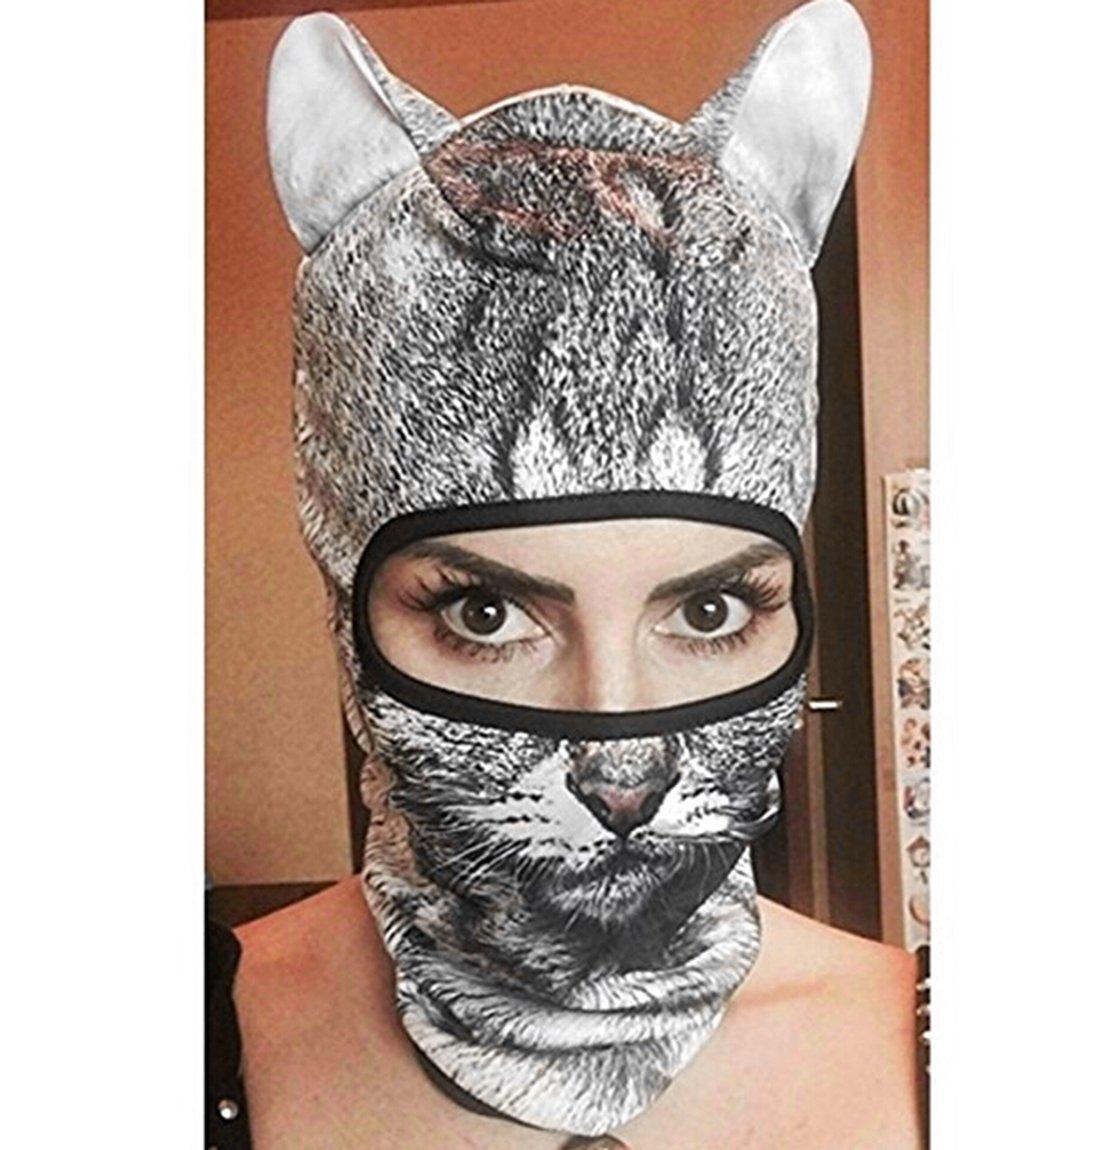 Outgeek Cat Mask, Women Men Balaclava Summer Full Face Hat Animal Ears Sports Helmet Climbing Fishing Cap (2PCS Cats) by Outgeek (Image #2)